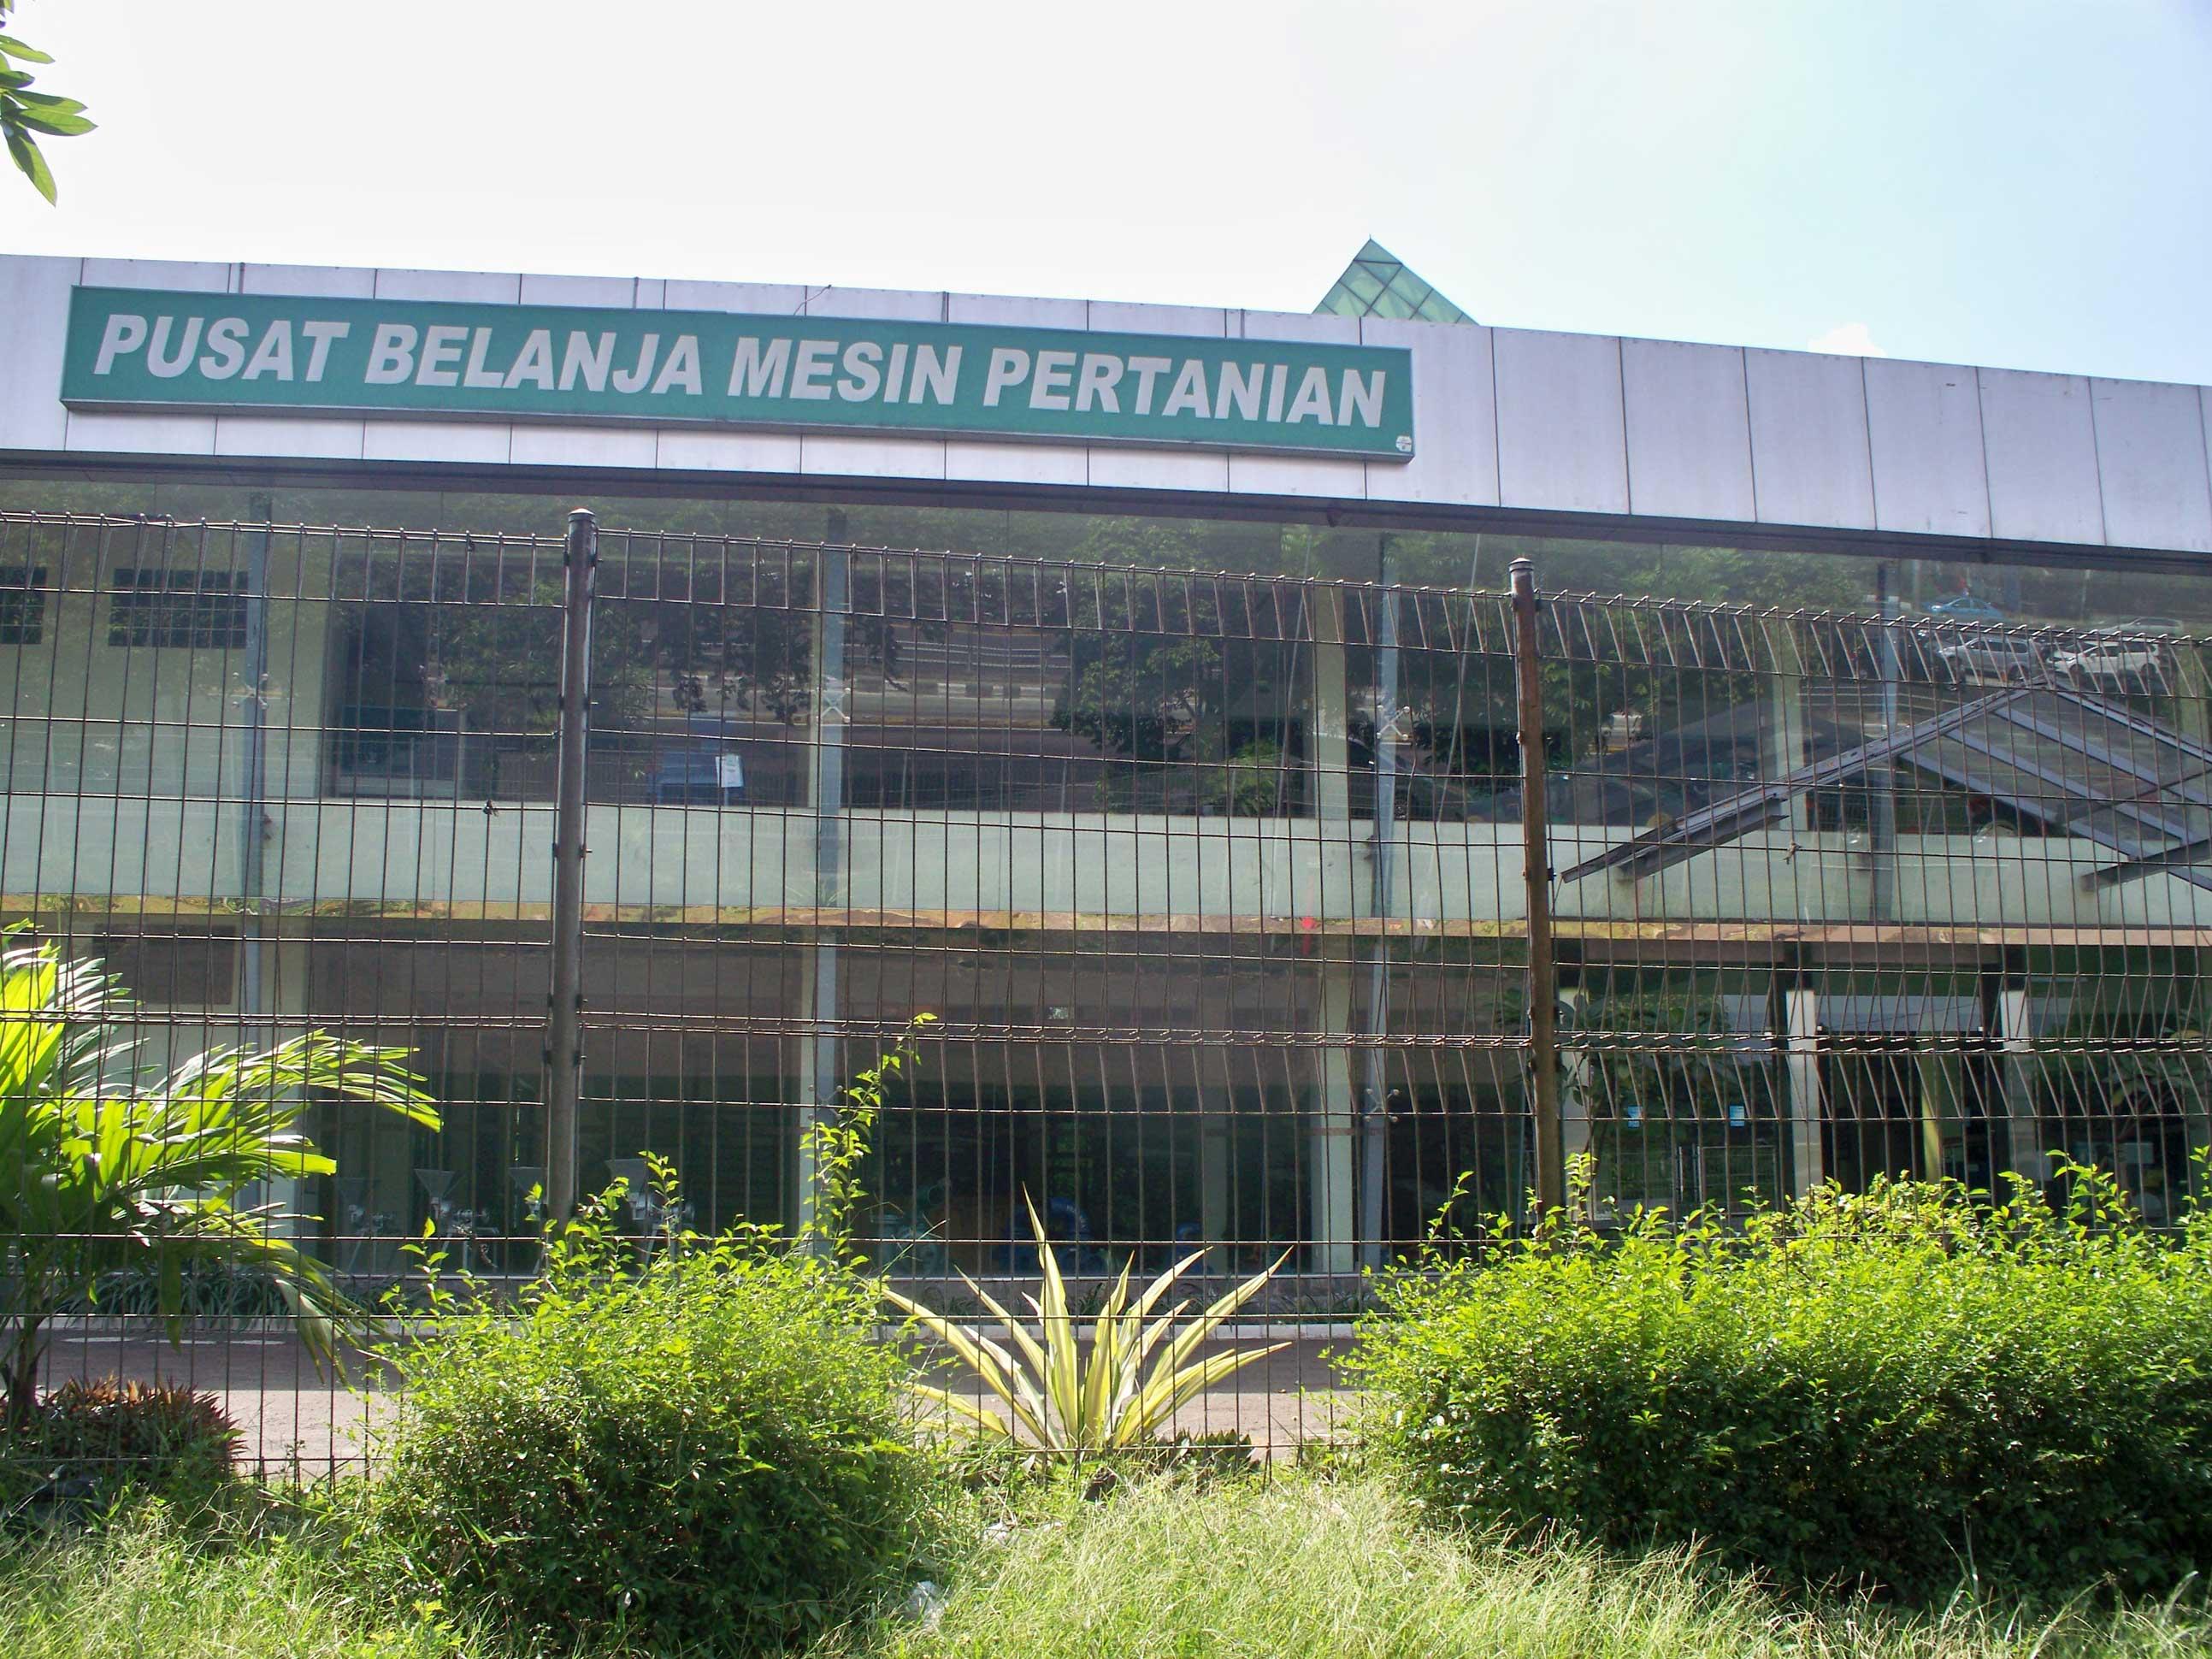 File:Pusat Belanja Mesin Pertanian - panoramio.jpg